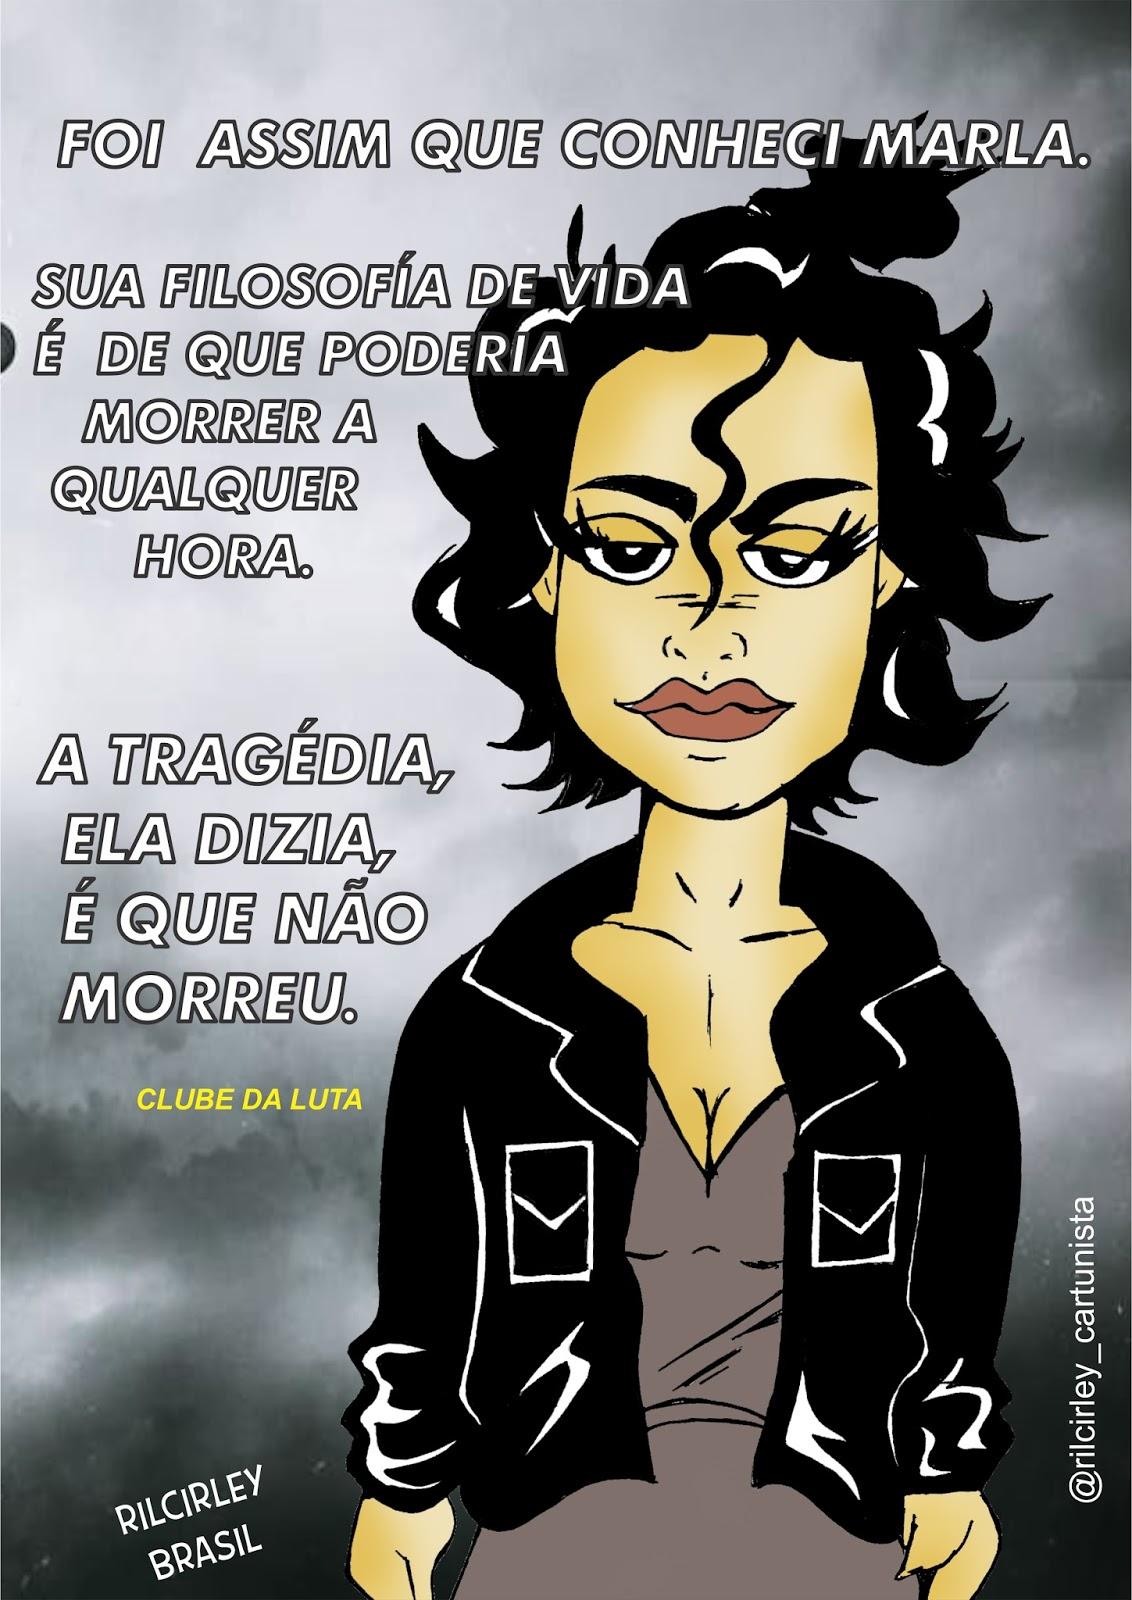 Rilcirley Brasil Cartum Frases De Marlaclube Da Luta